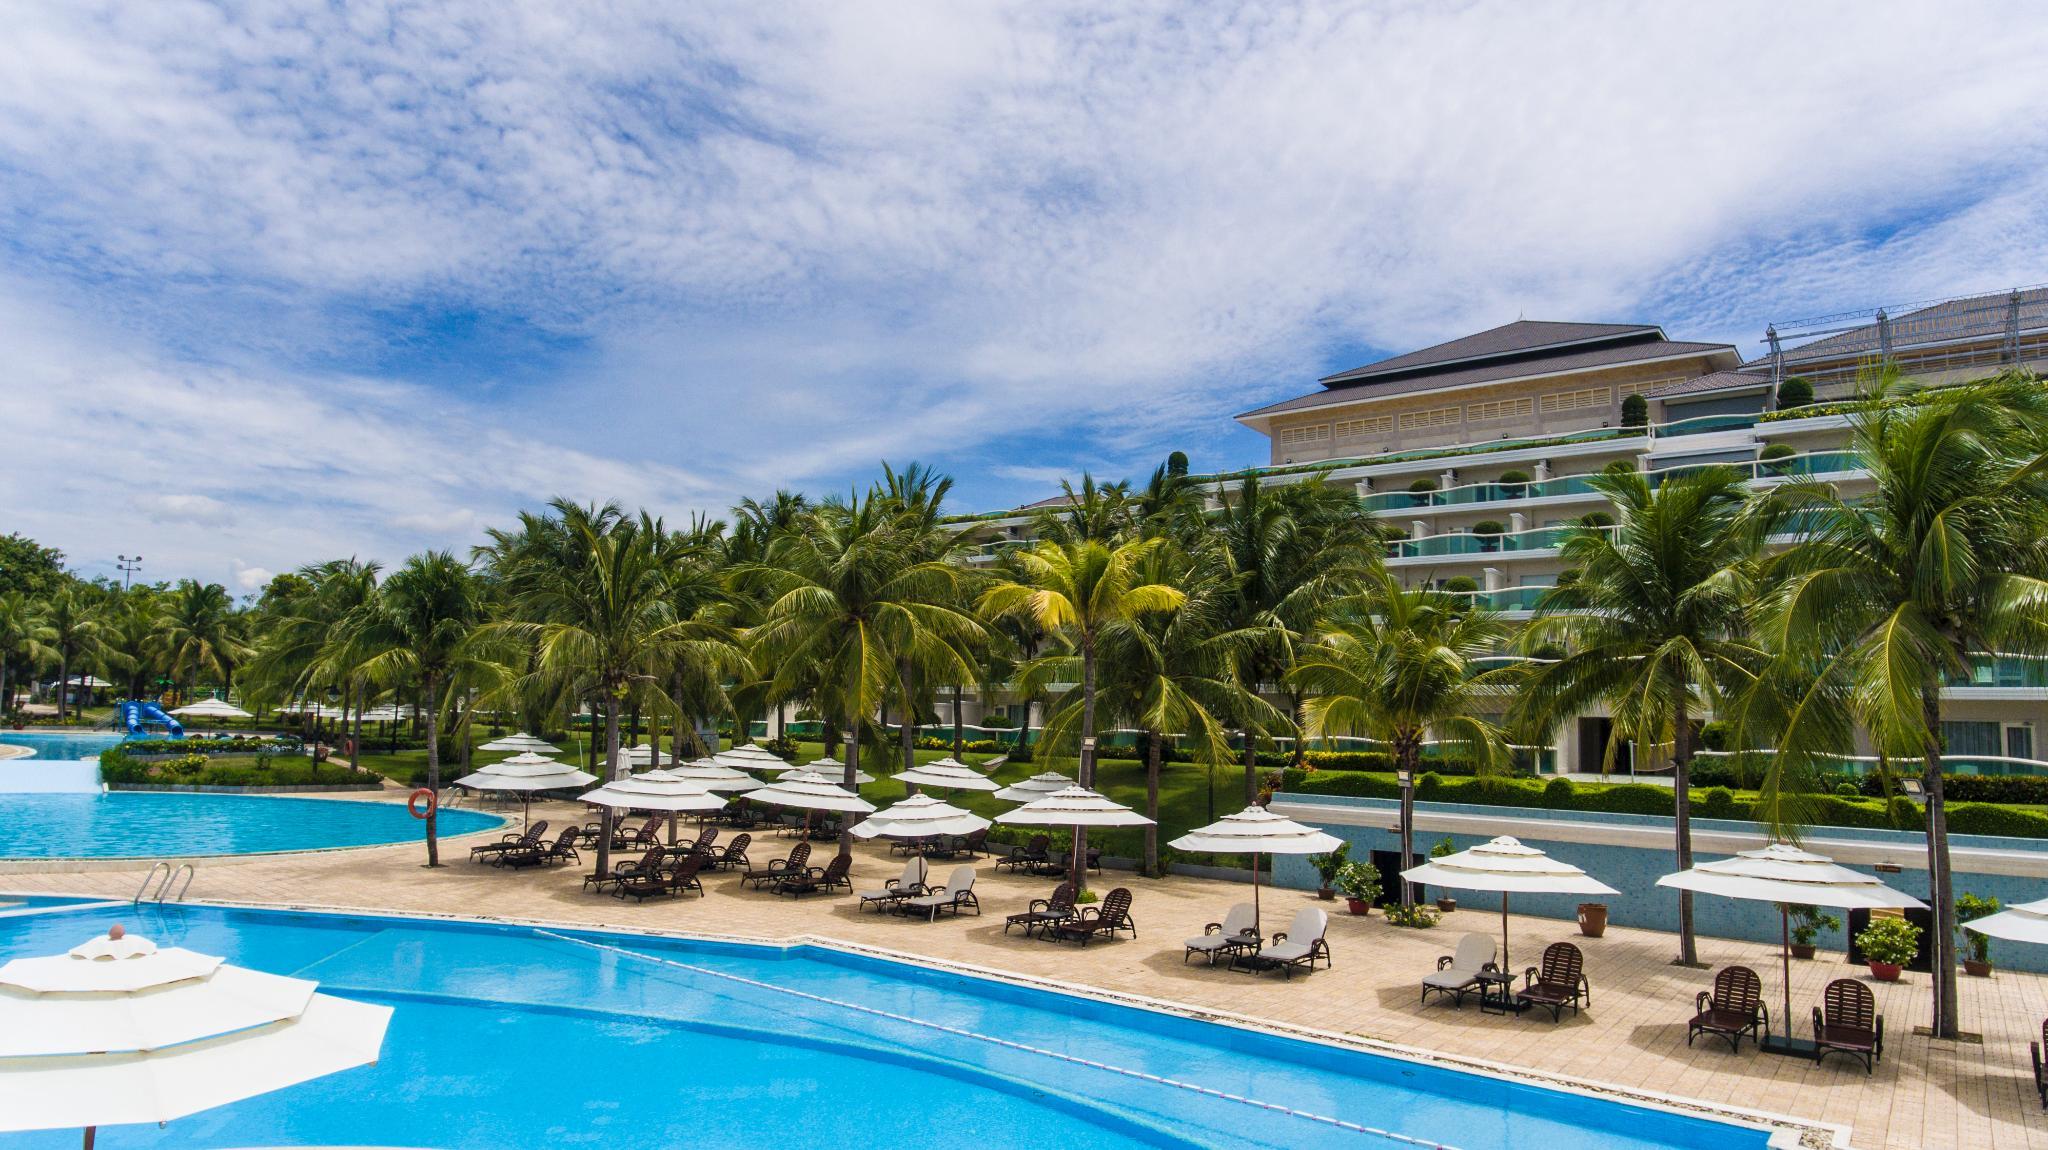 Beach Hotel In Phan Thiet Vietnam